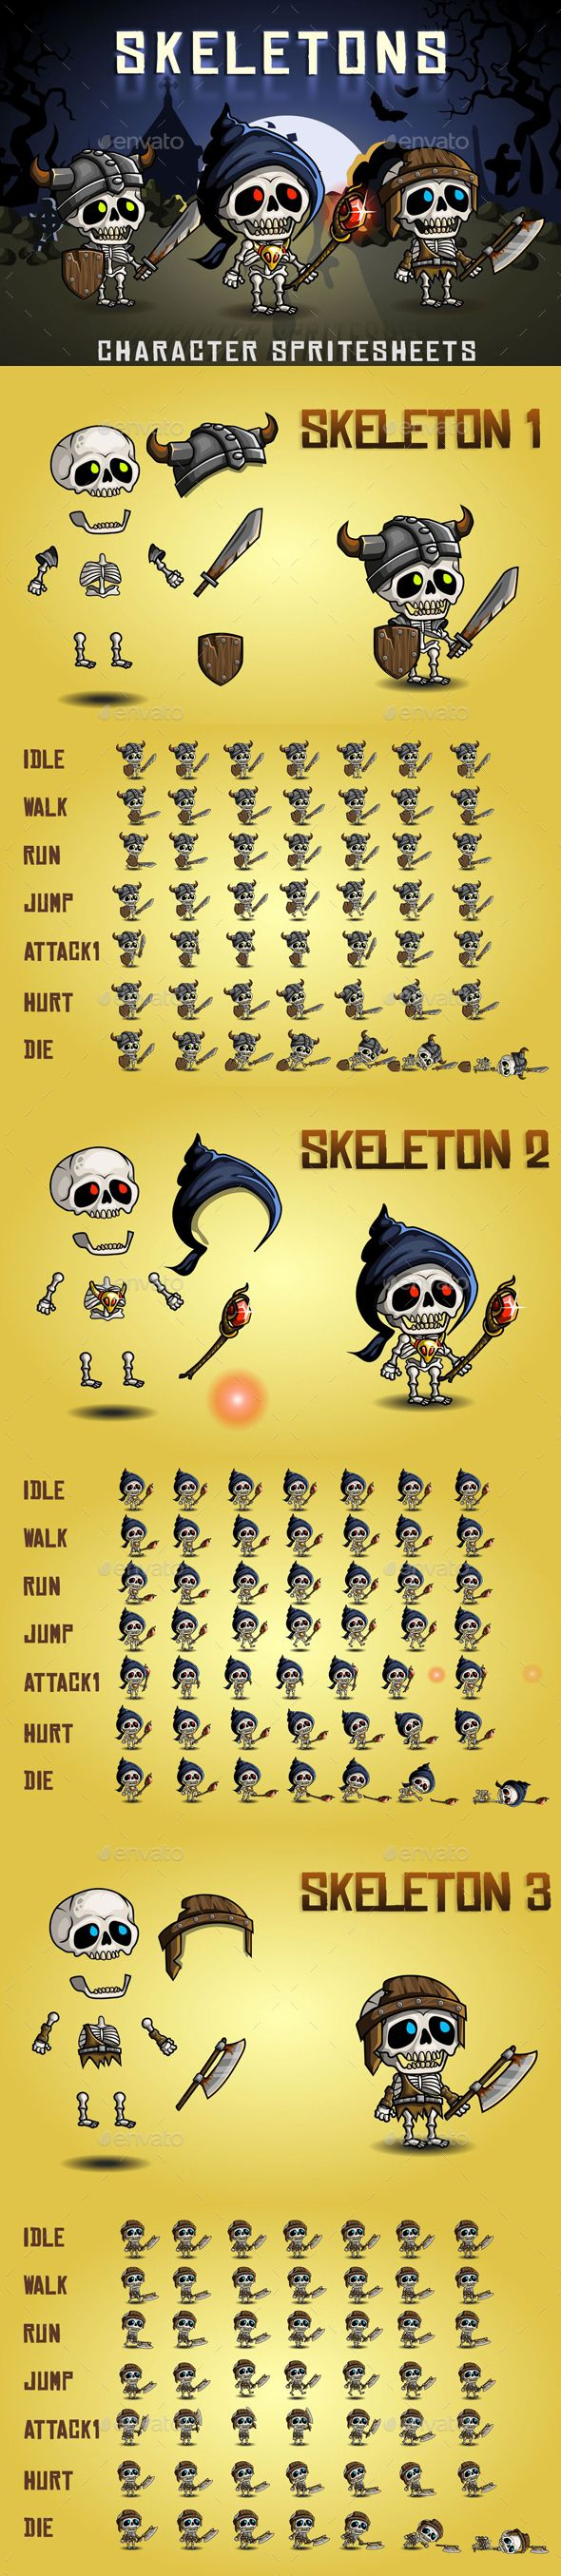 Skeletons 2D Game Character Sprite Sheet Download here: https://graphicriver.net/item/skeletons-2d-game-character-sprite-sheet/19563497?ref=KlitVogli